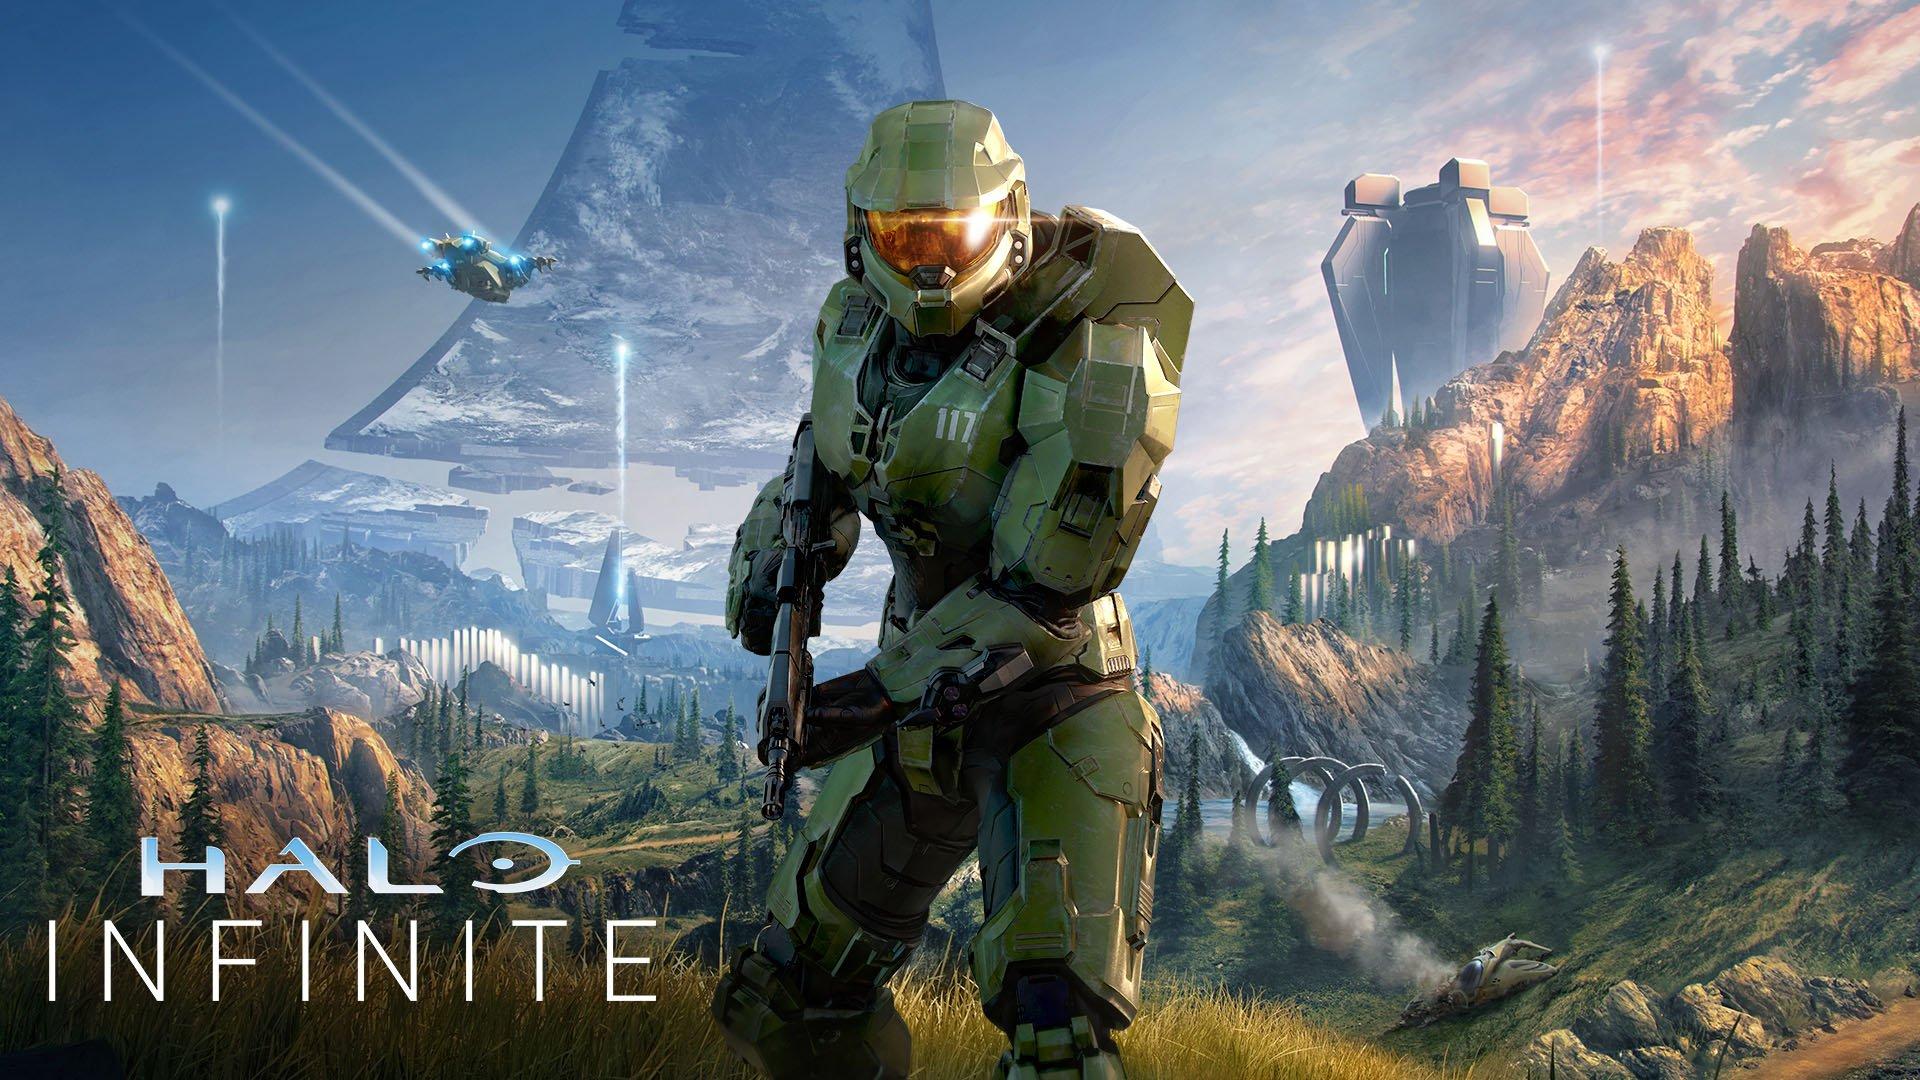 Halo-Infinity-key-art.jpg